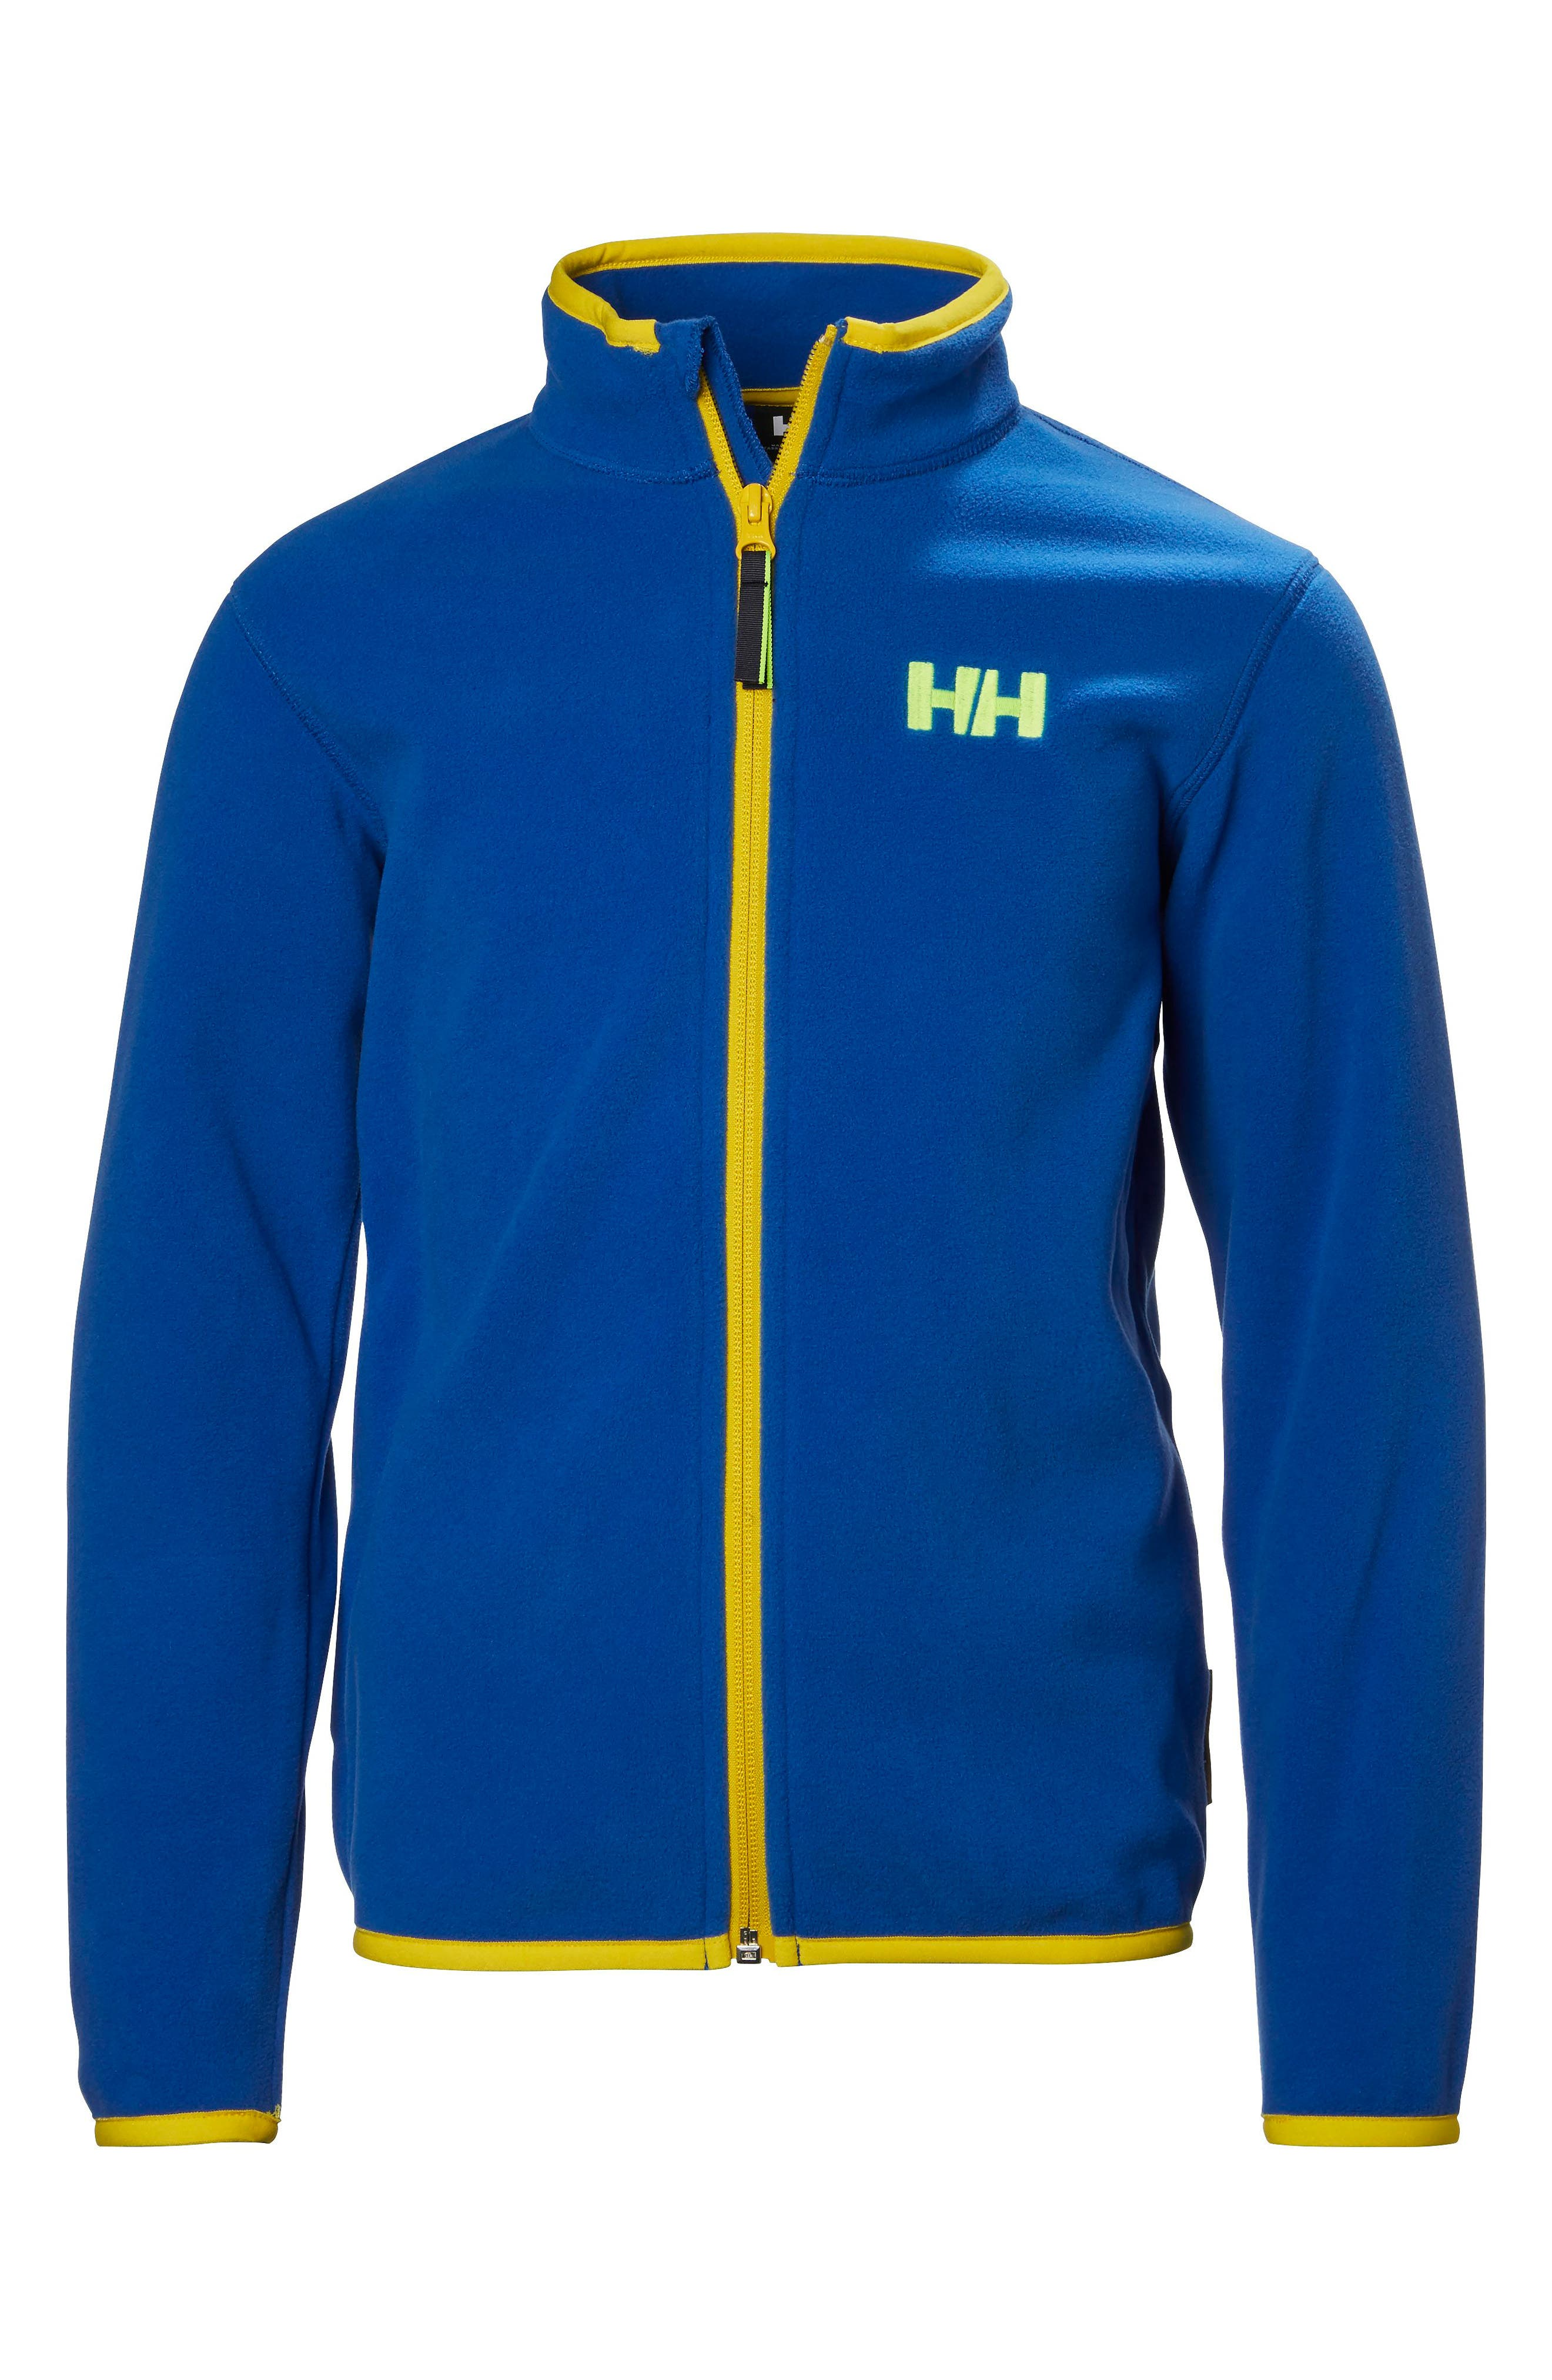 Alternate Image 1 Selected - Helly Hansen Jr. Daybreaker Polartec® Fleece Jacket (Big Boys)